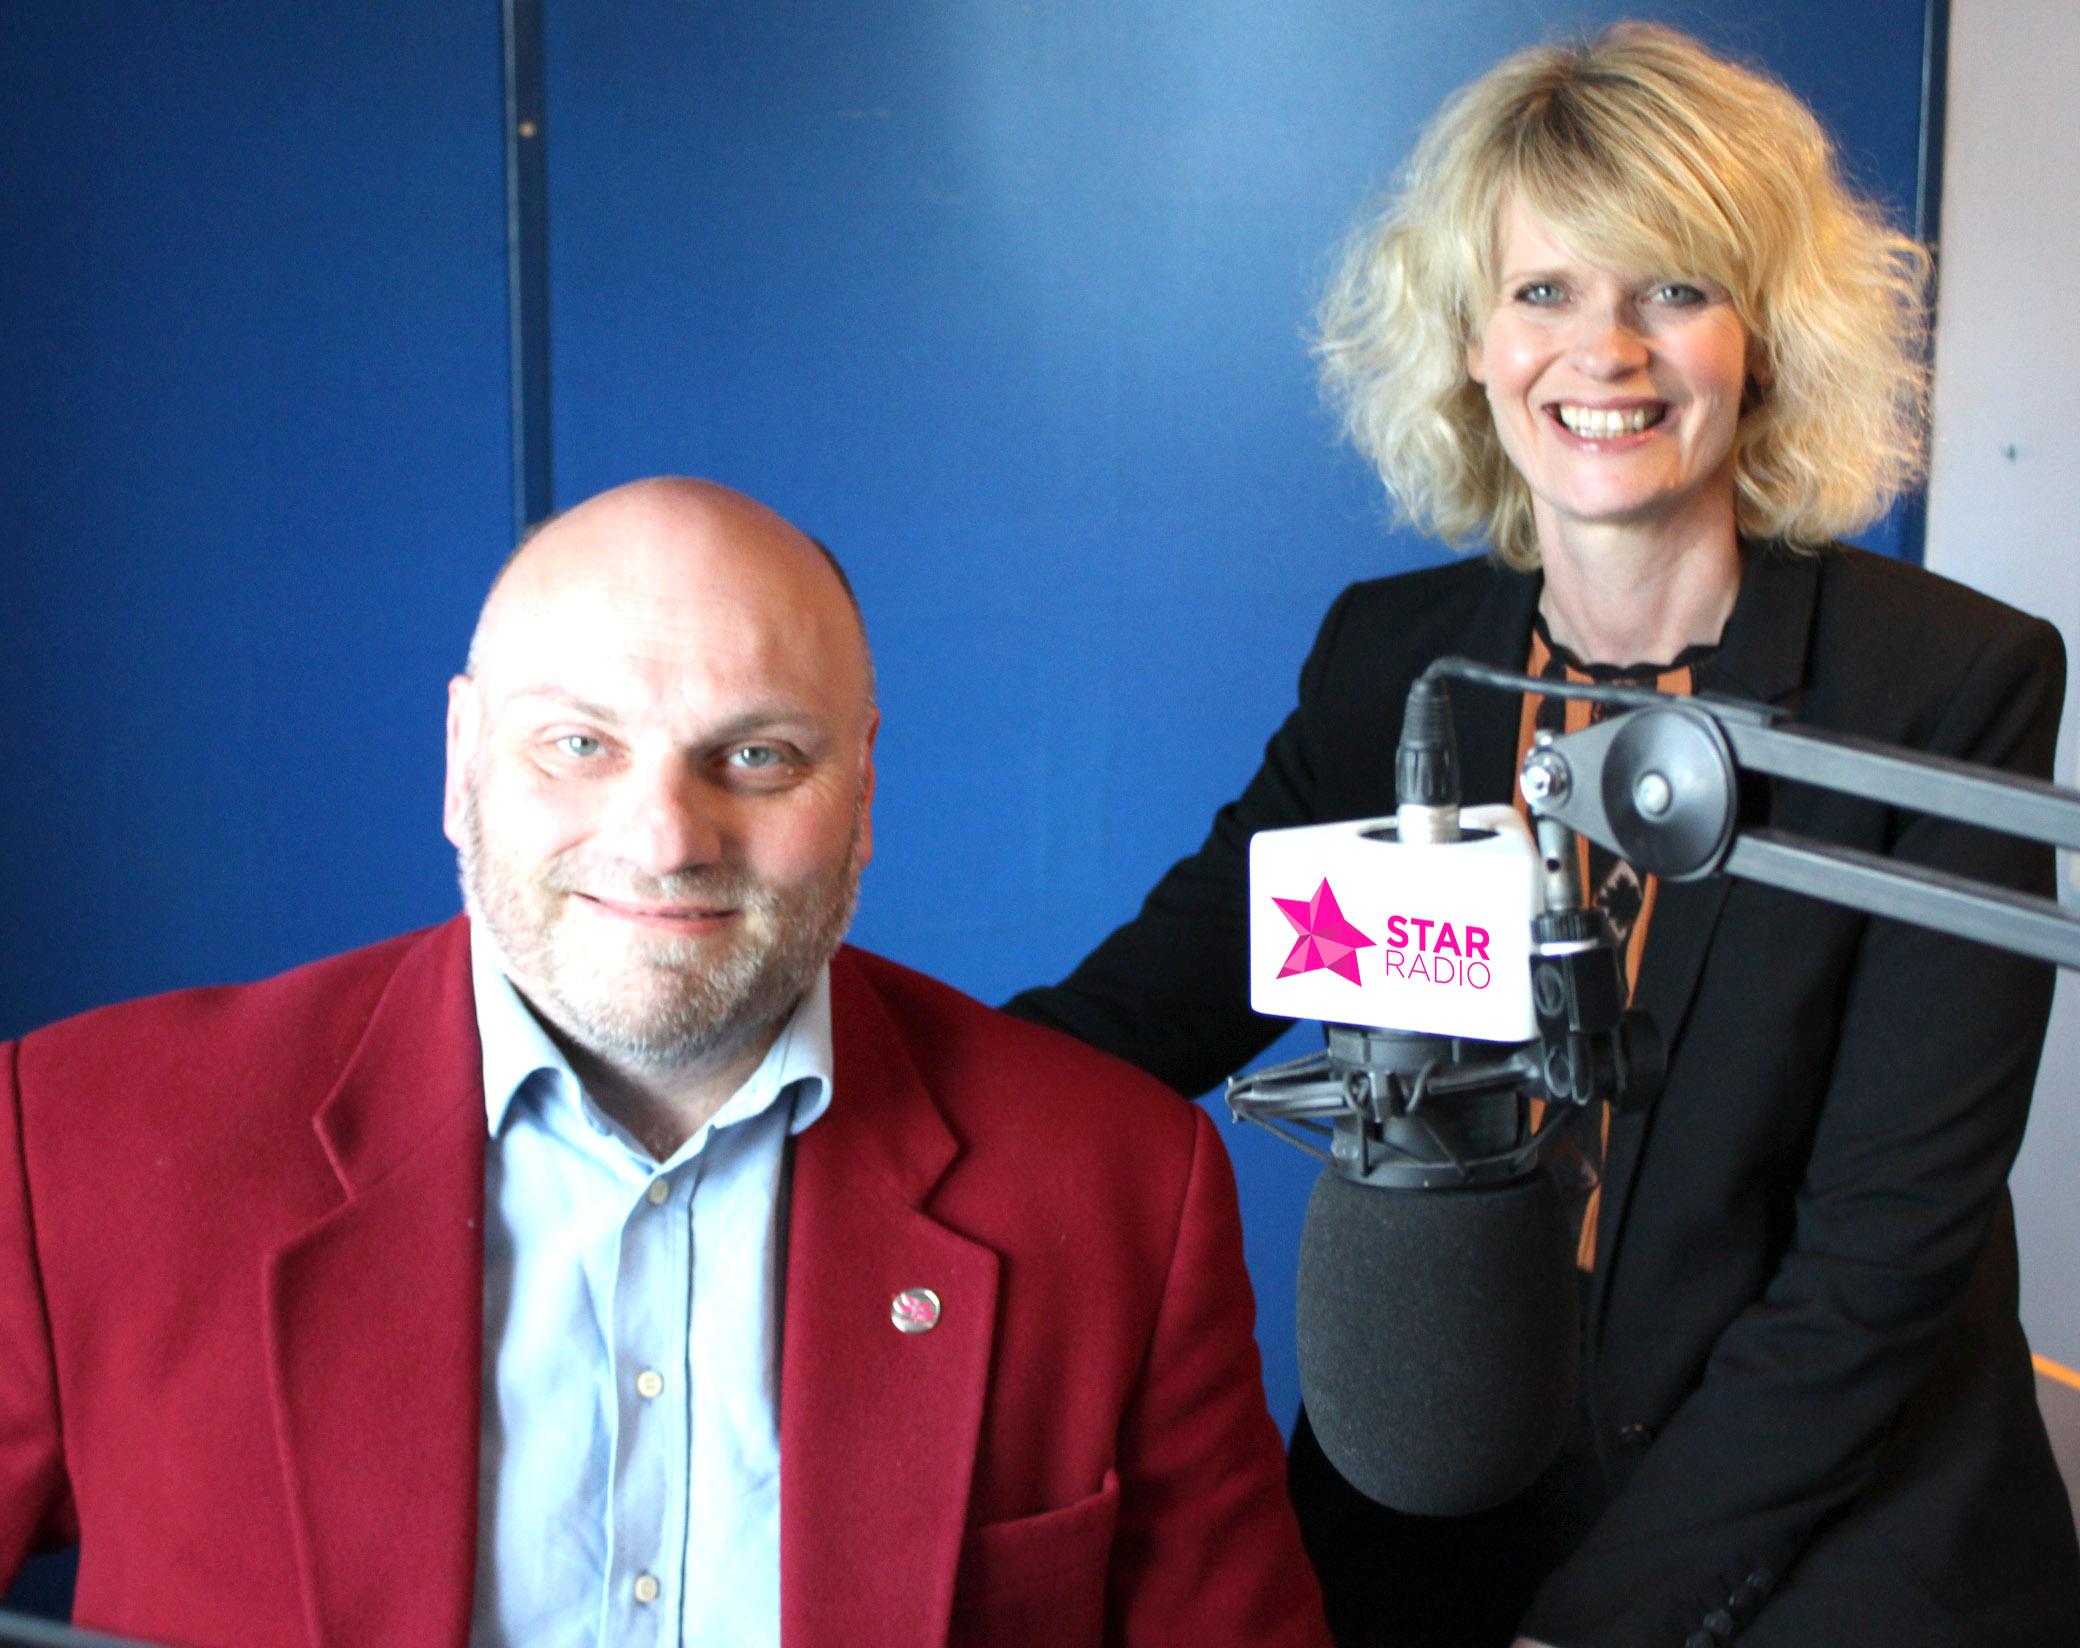 Newton News Launch New Partnership with Star Radio